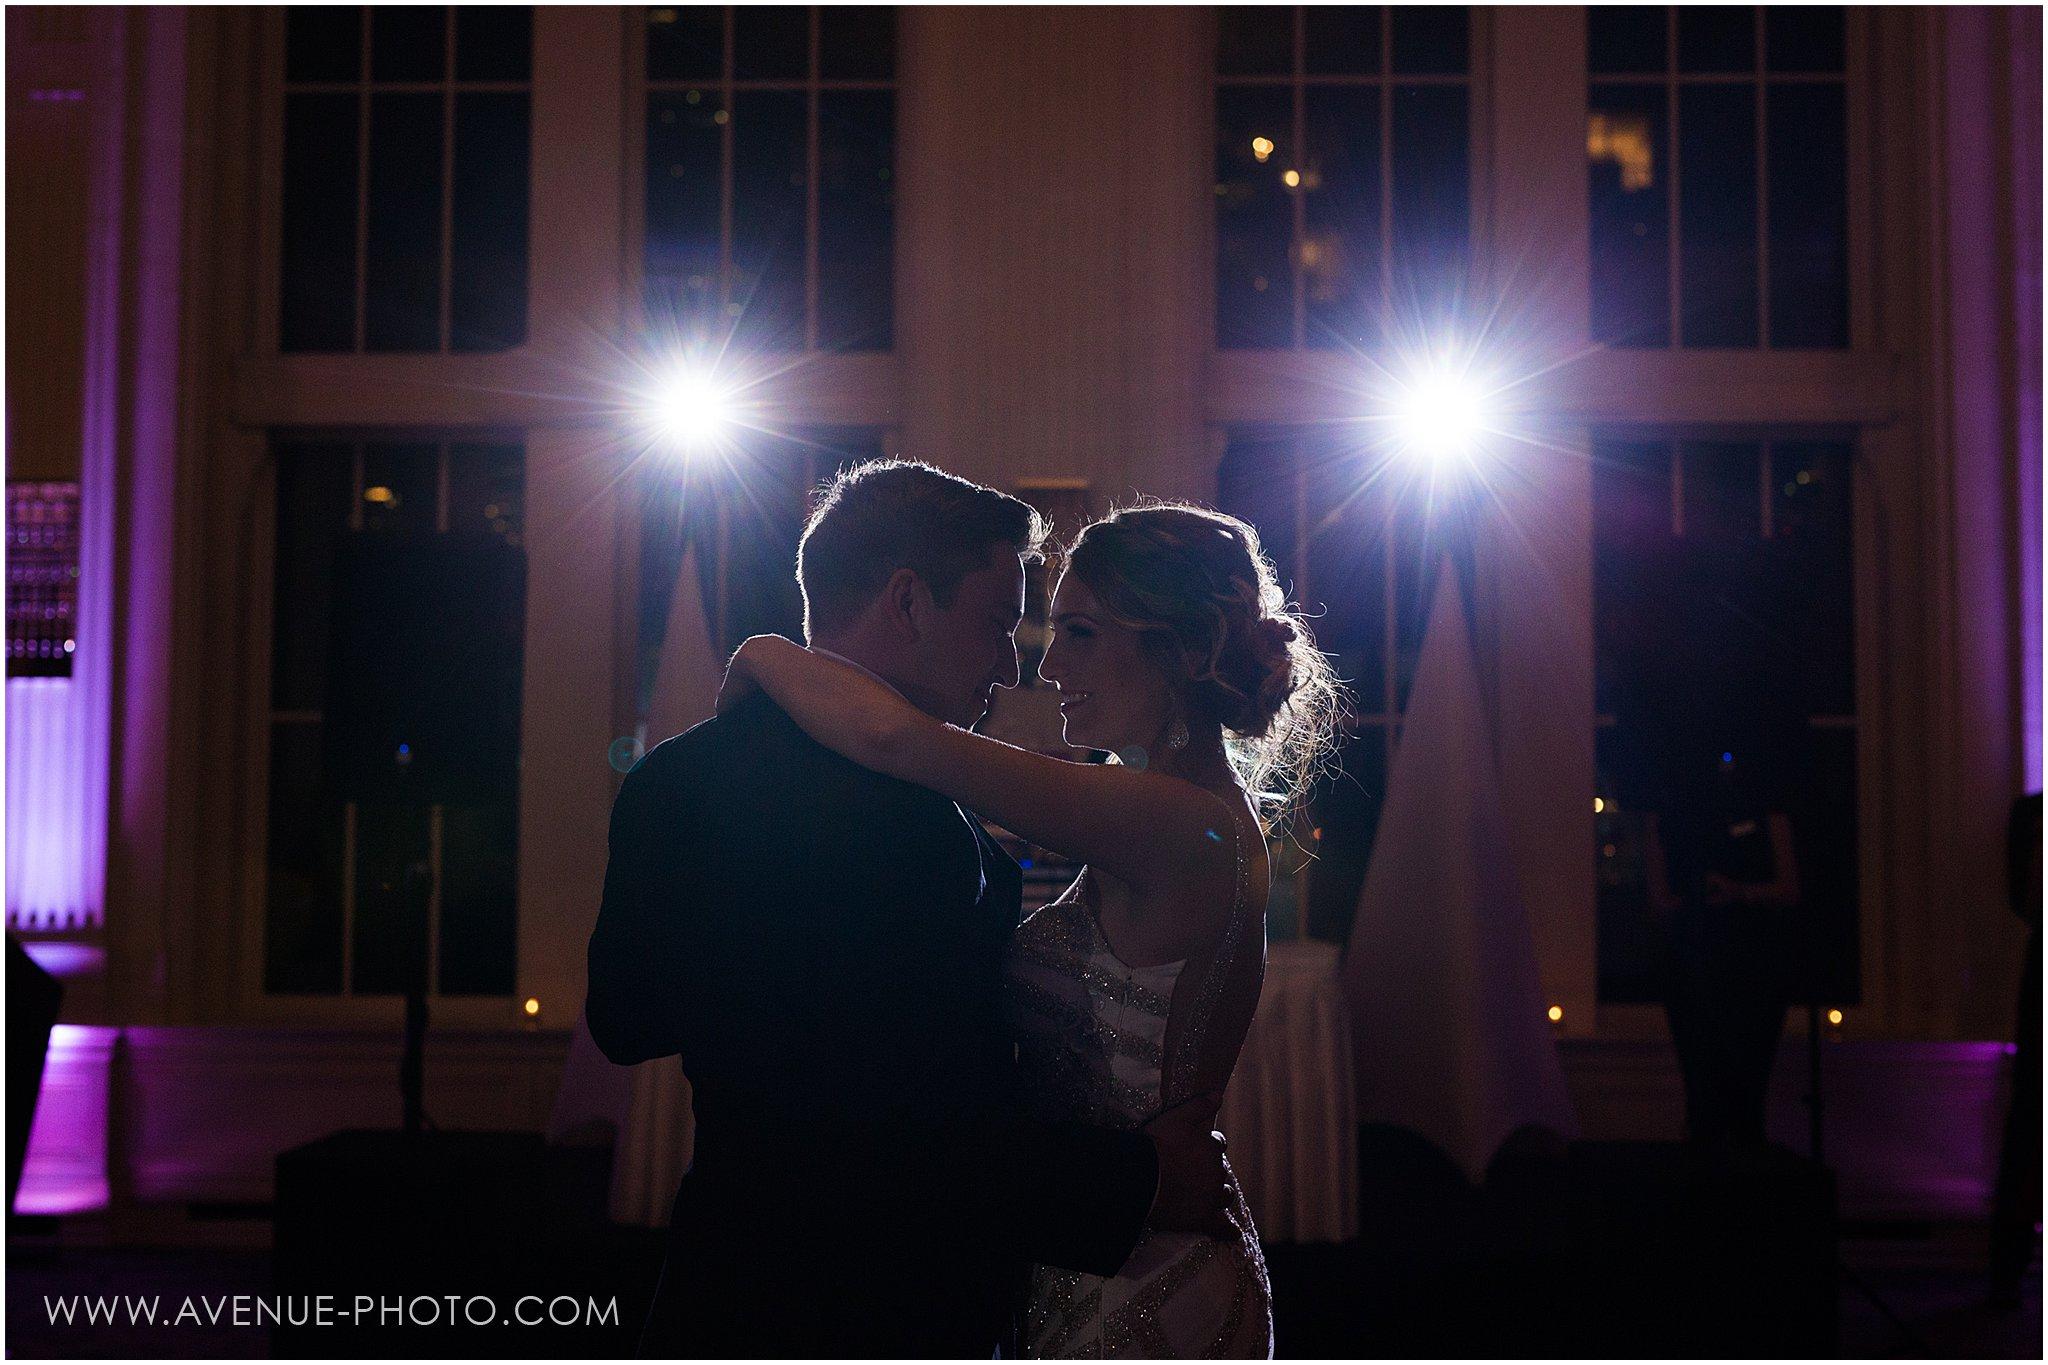 First Dance Crystal Ballroom Wedding at King Edward Hotel, King Eddie Hotel Wedding, Metropolitan United Wedding, St James Gardens Wedding Photos, Toronto Wedding photographer, Avenue Photo